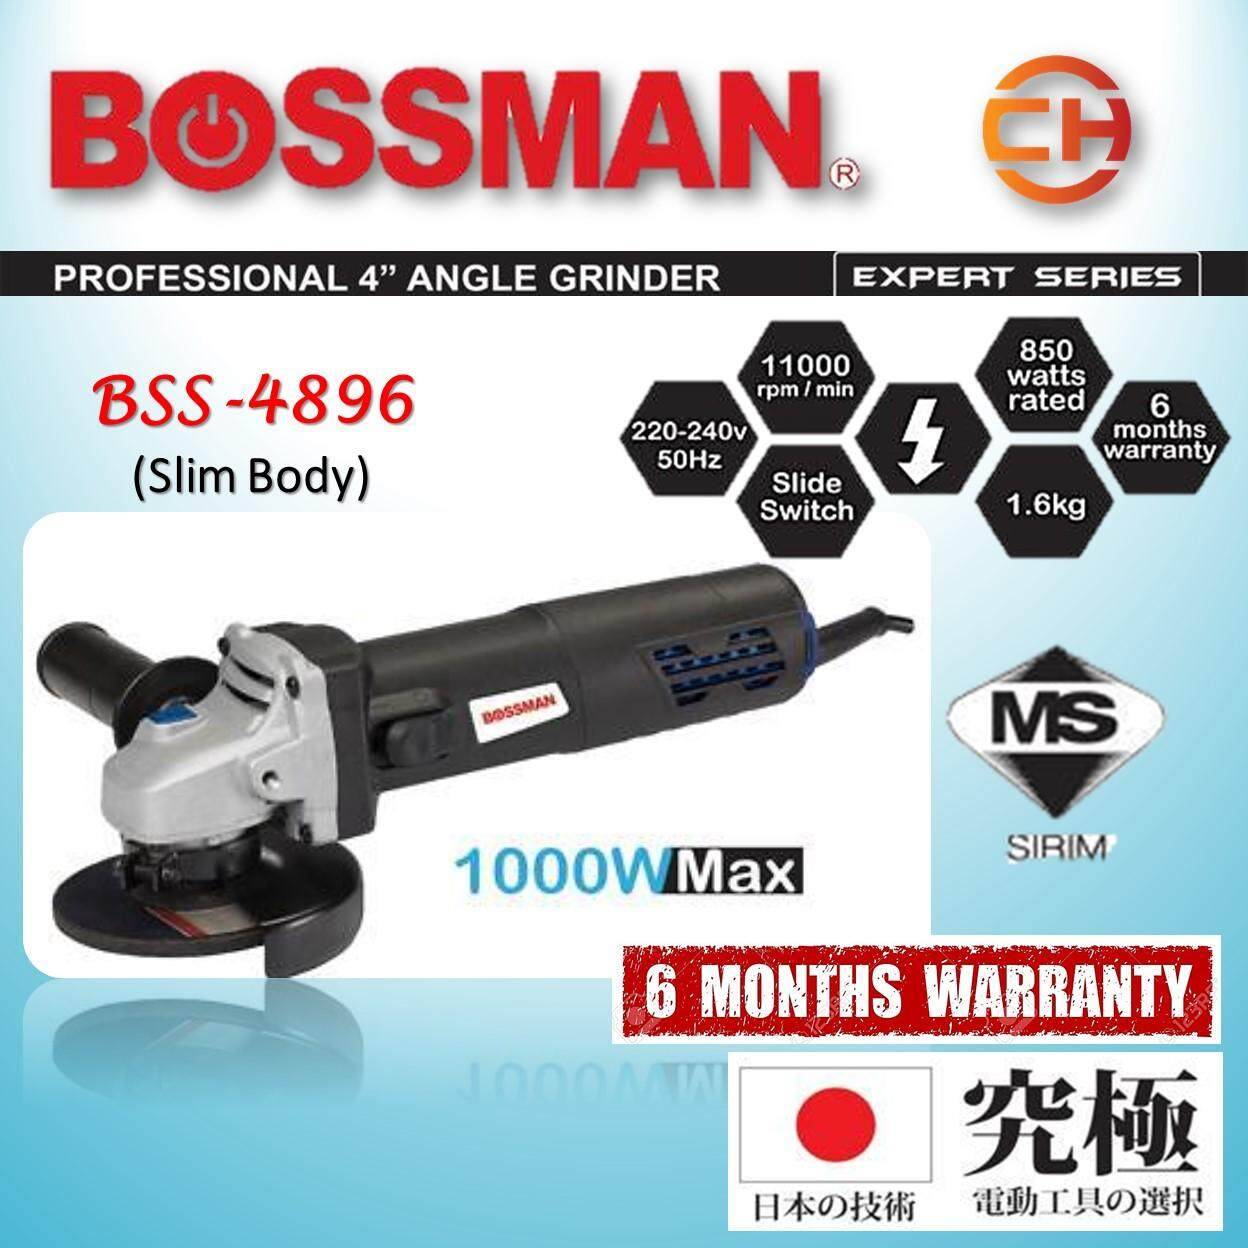 BOSSMAN Slim Body 4 Angle Grinder 1000W BSS-4896 [WITH SIRIM]